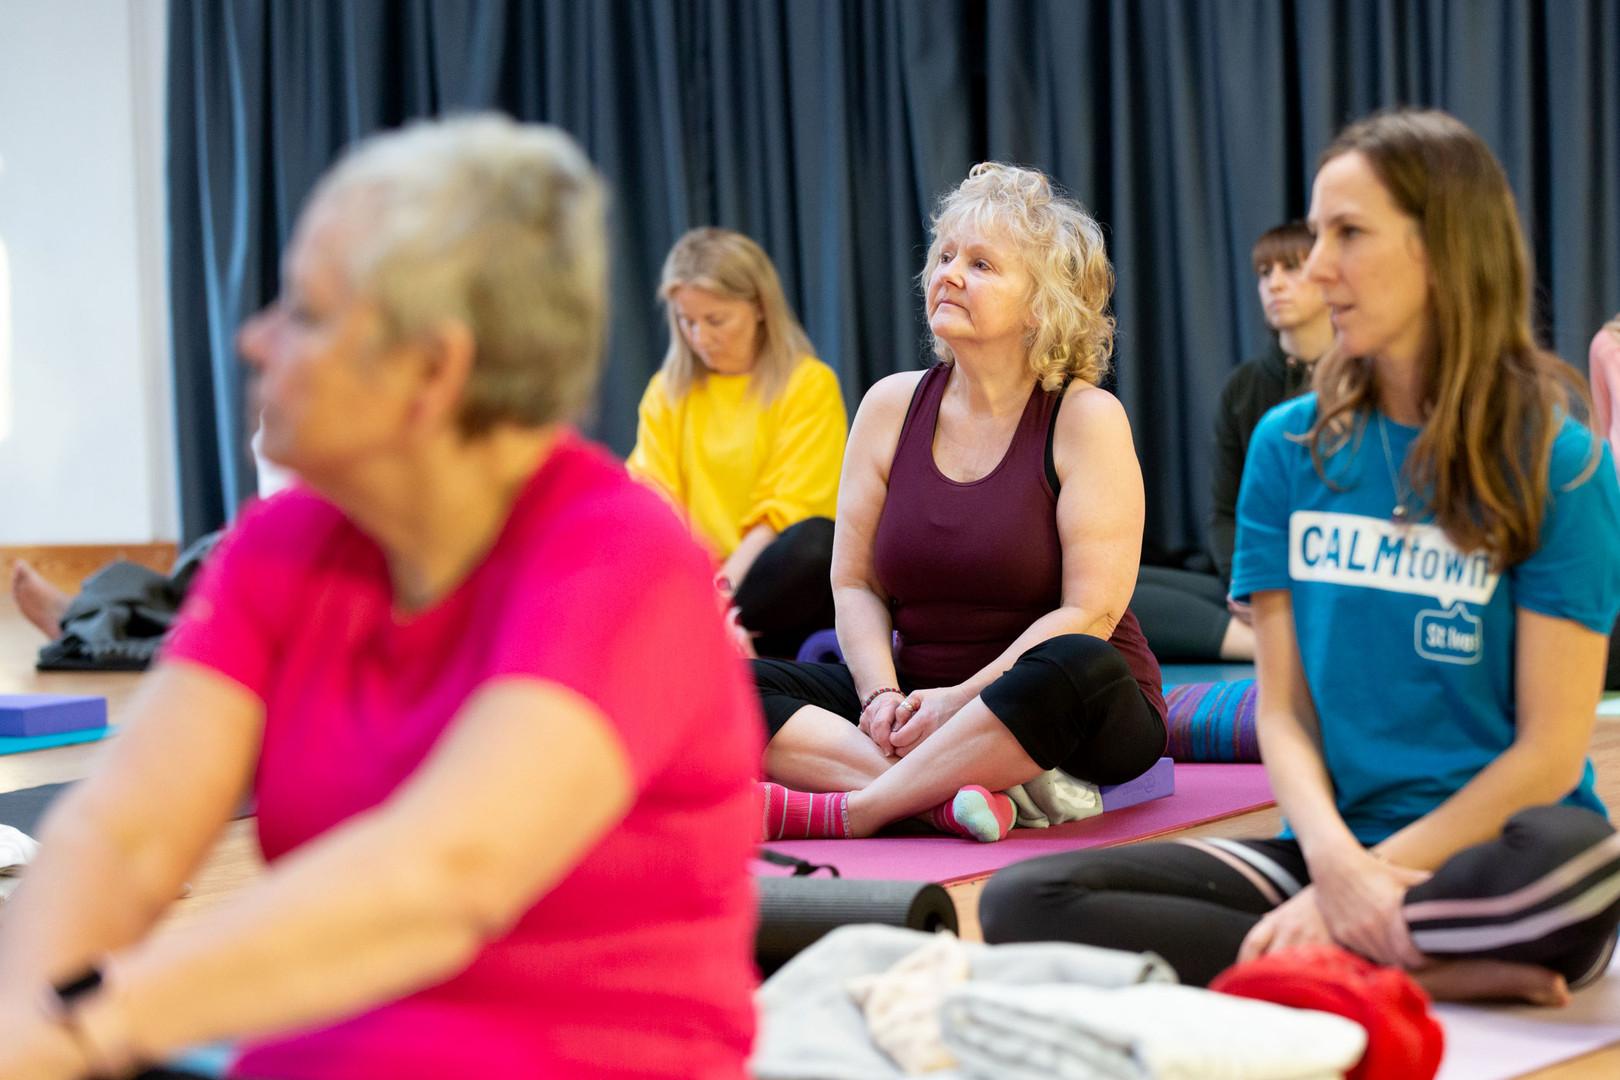 yogathon-feb-2020-3.jpg